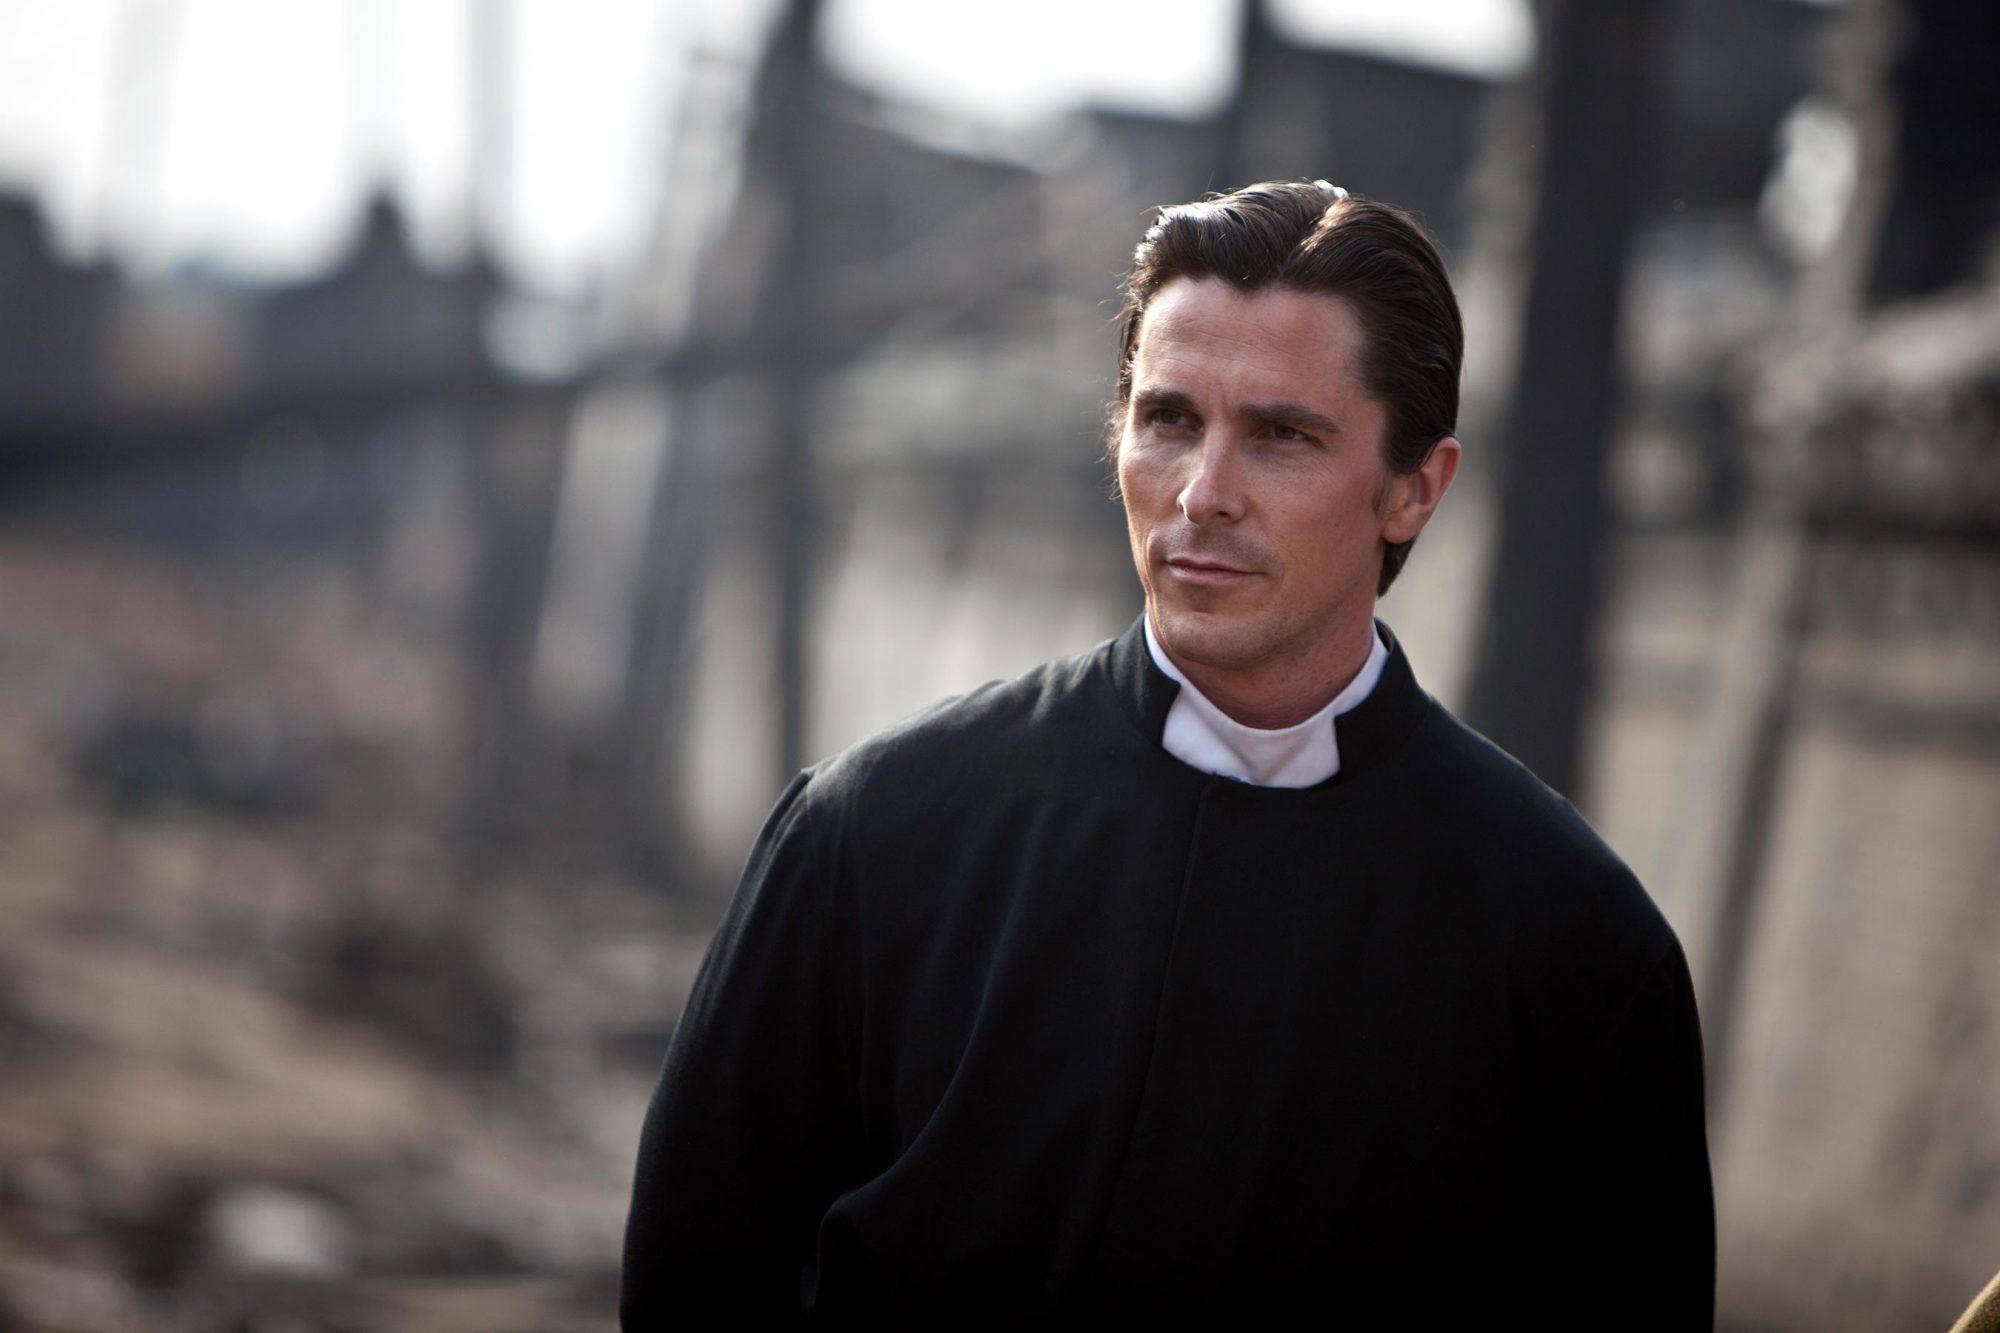 Christian Bale in Flowers of War, 2011